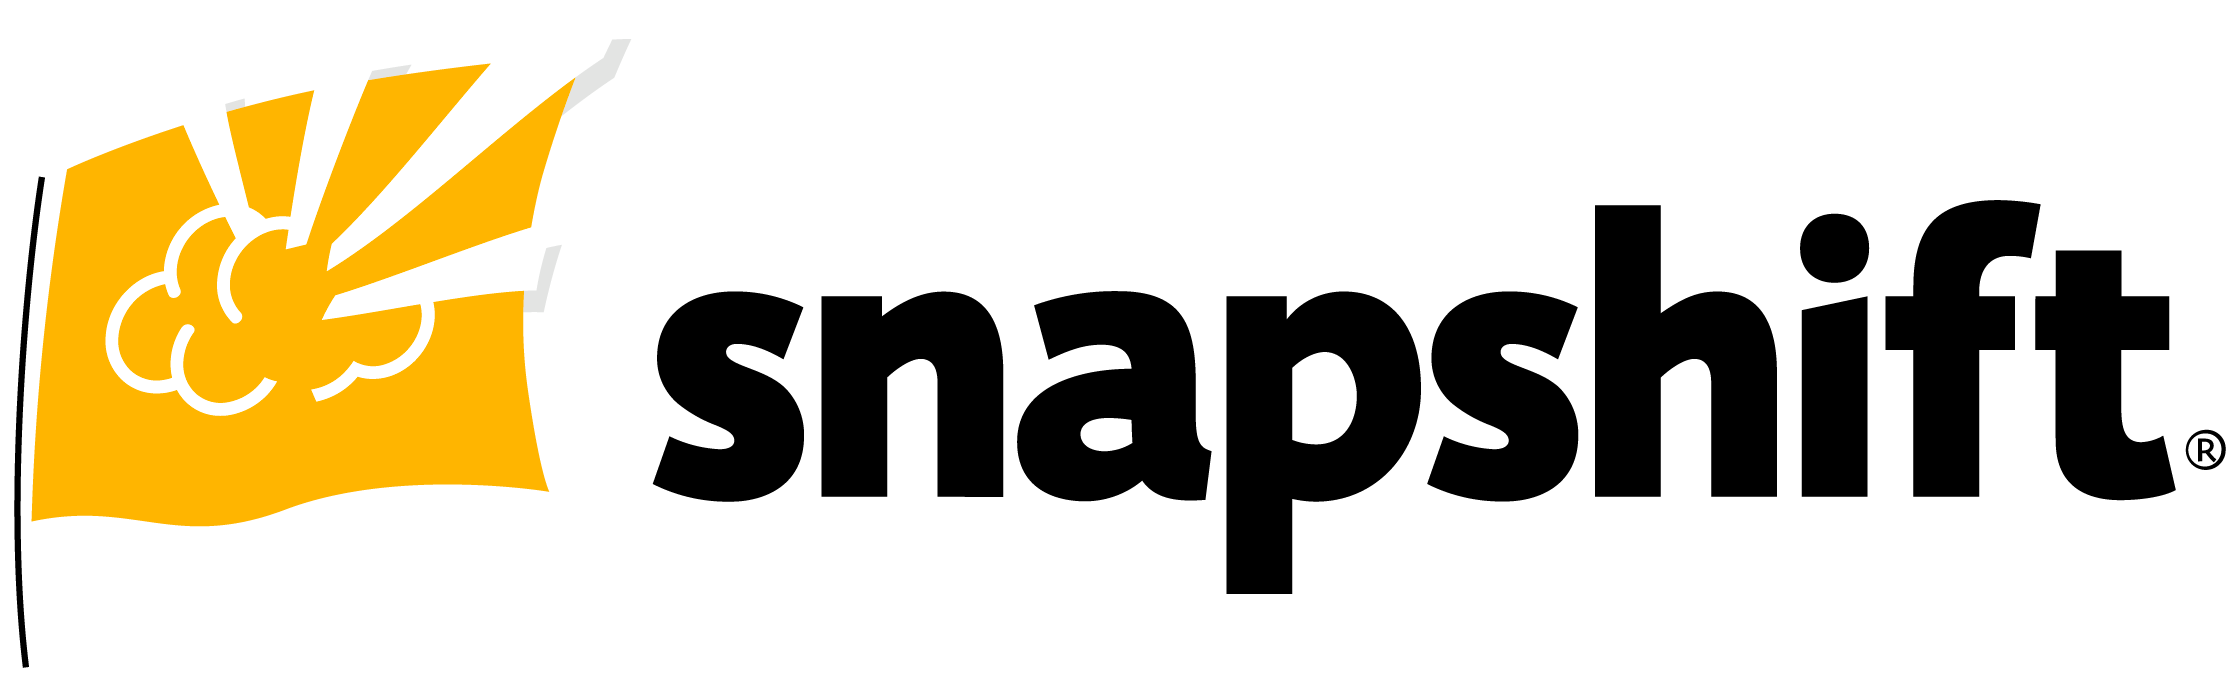 Snapshift-aspect-ratio-x